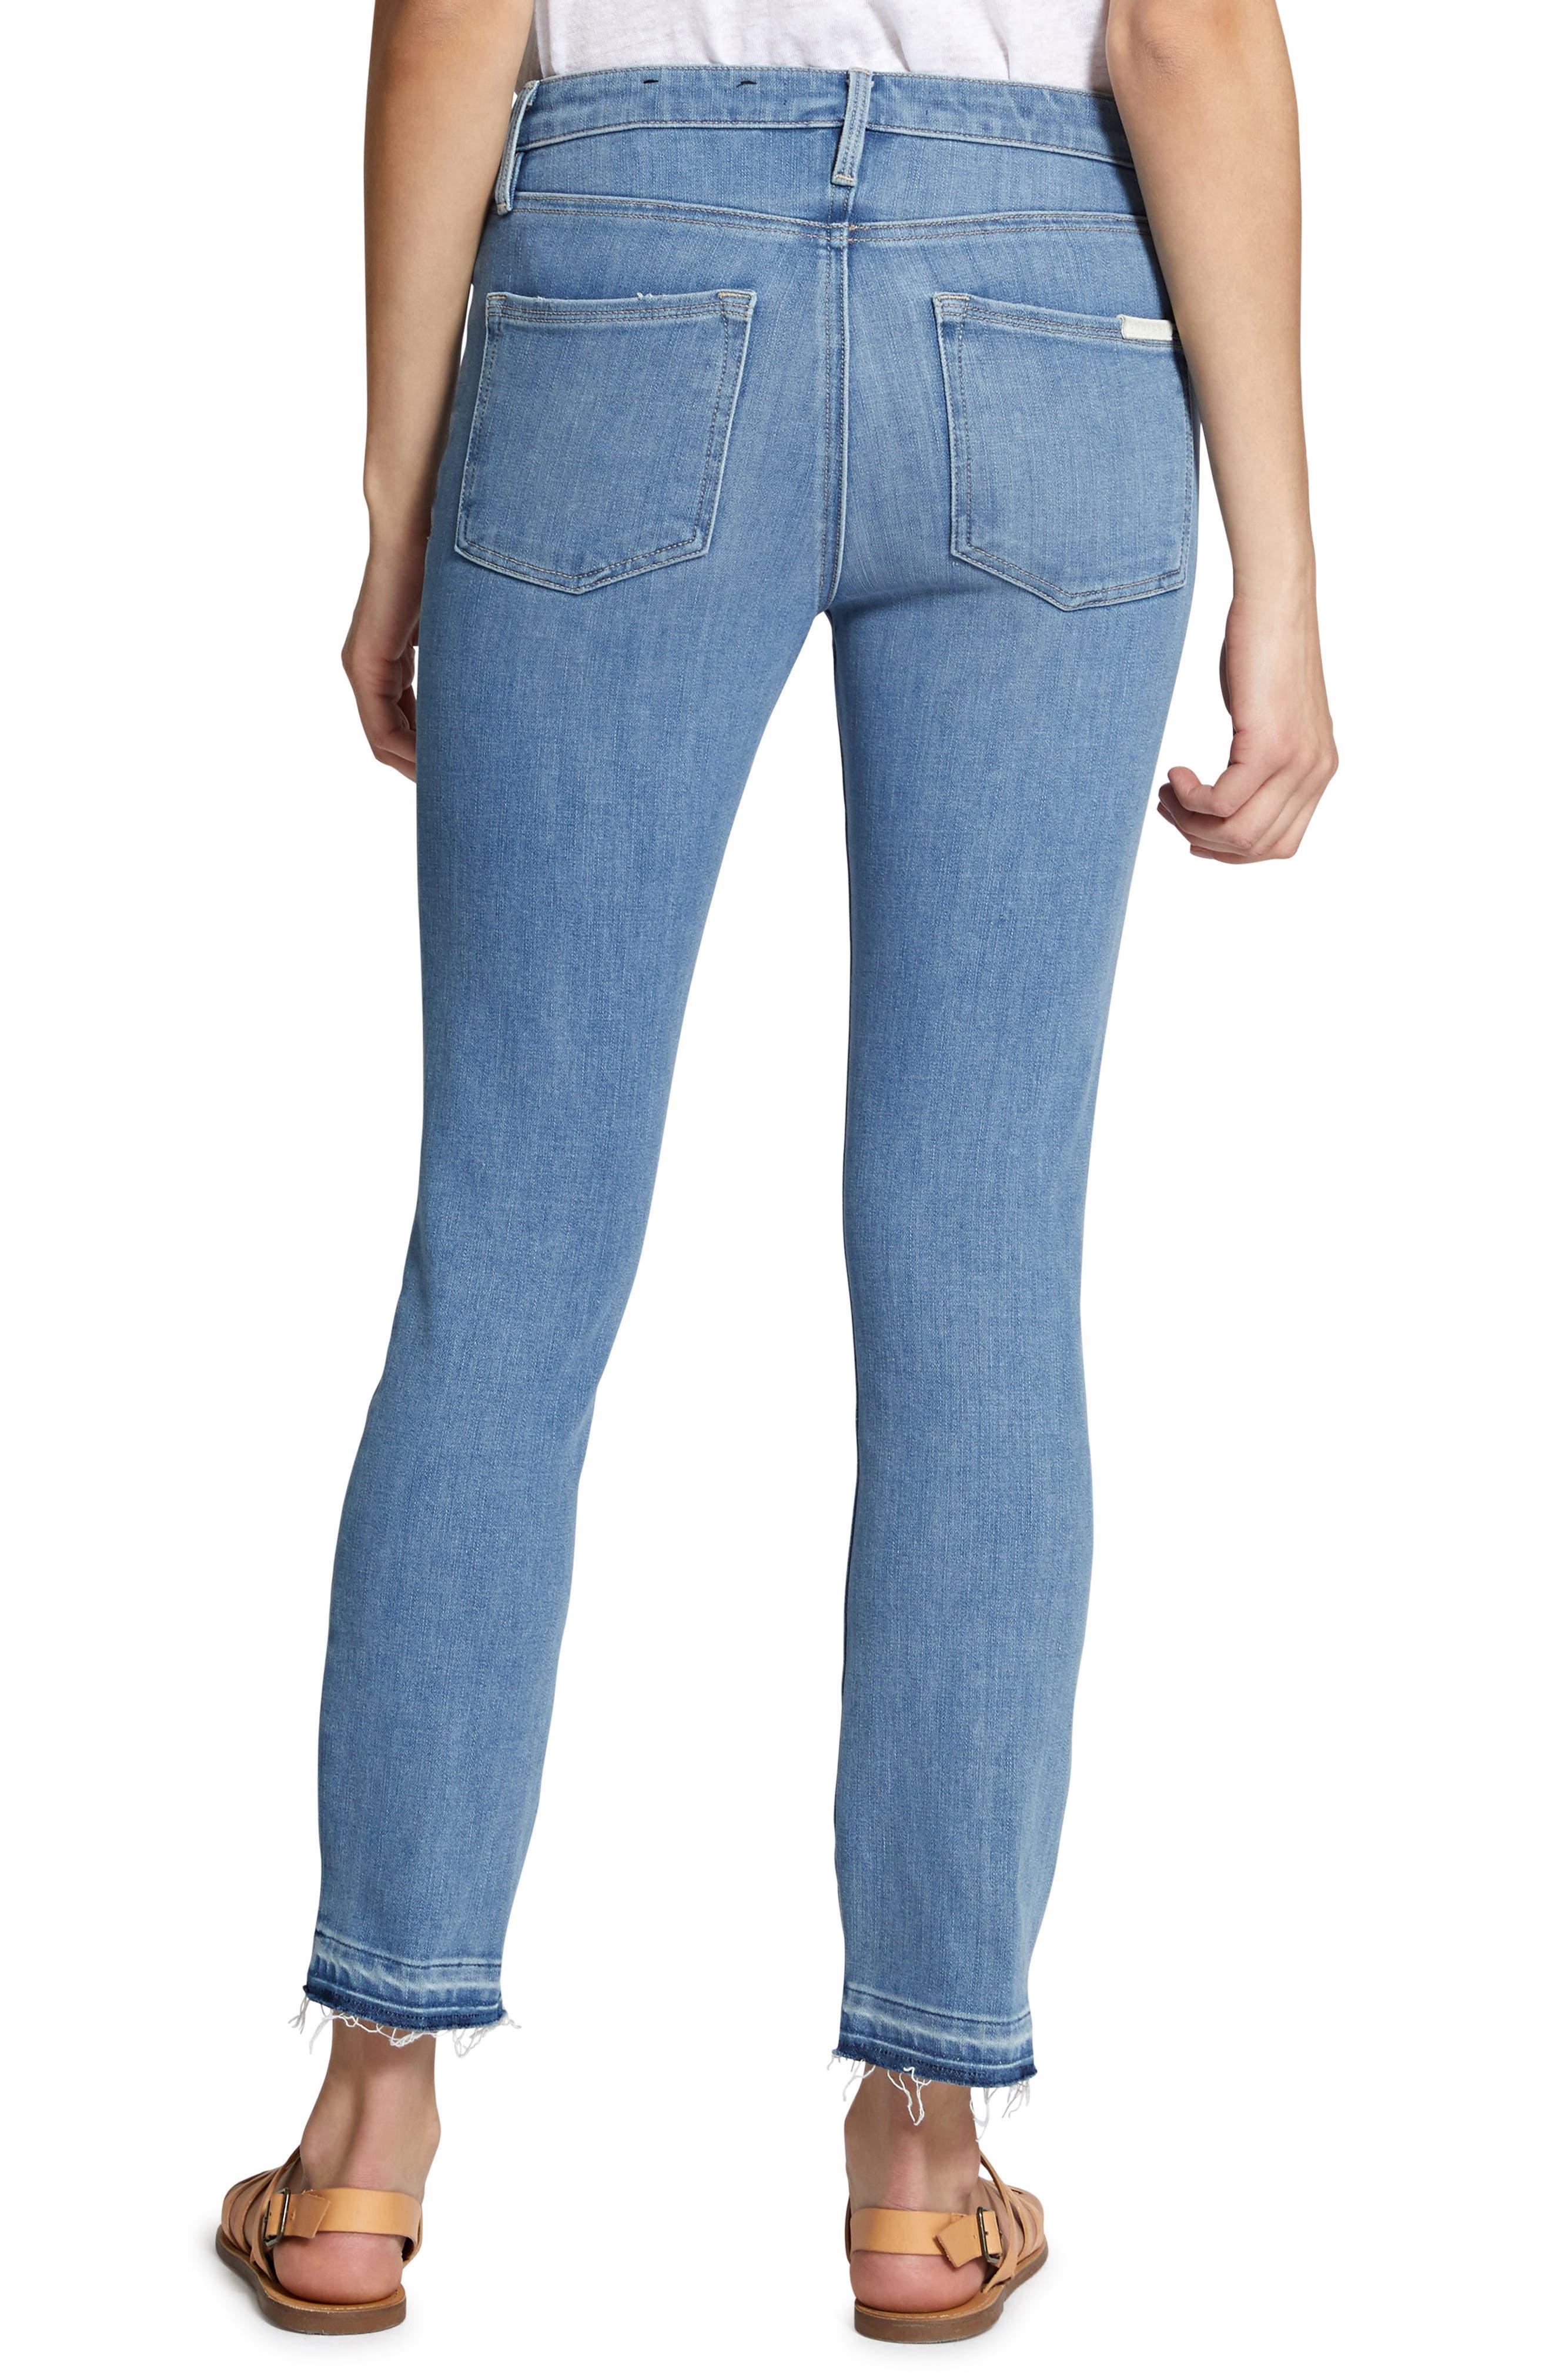 Robbie Spring Slit Jeans,                             Alternate thumbnail 2, color,                             421